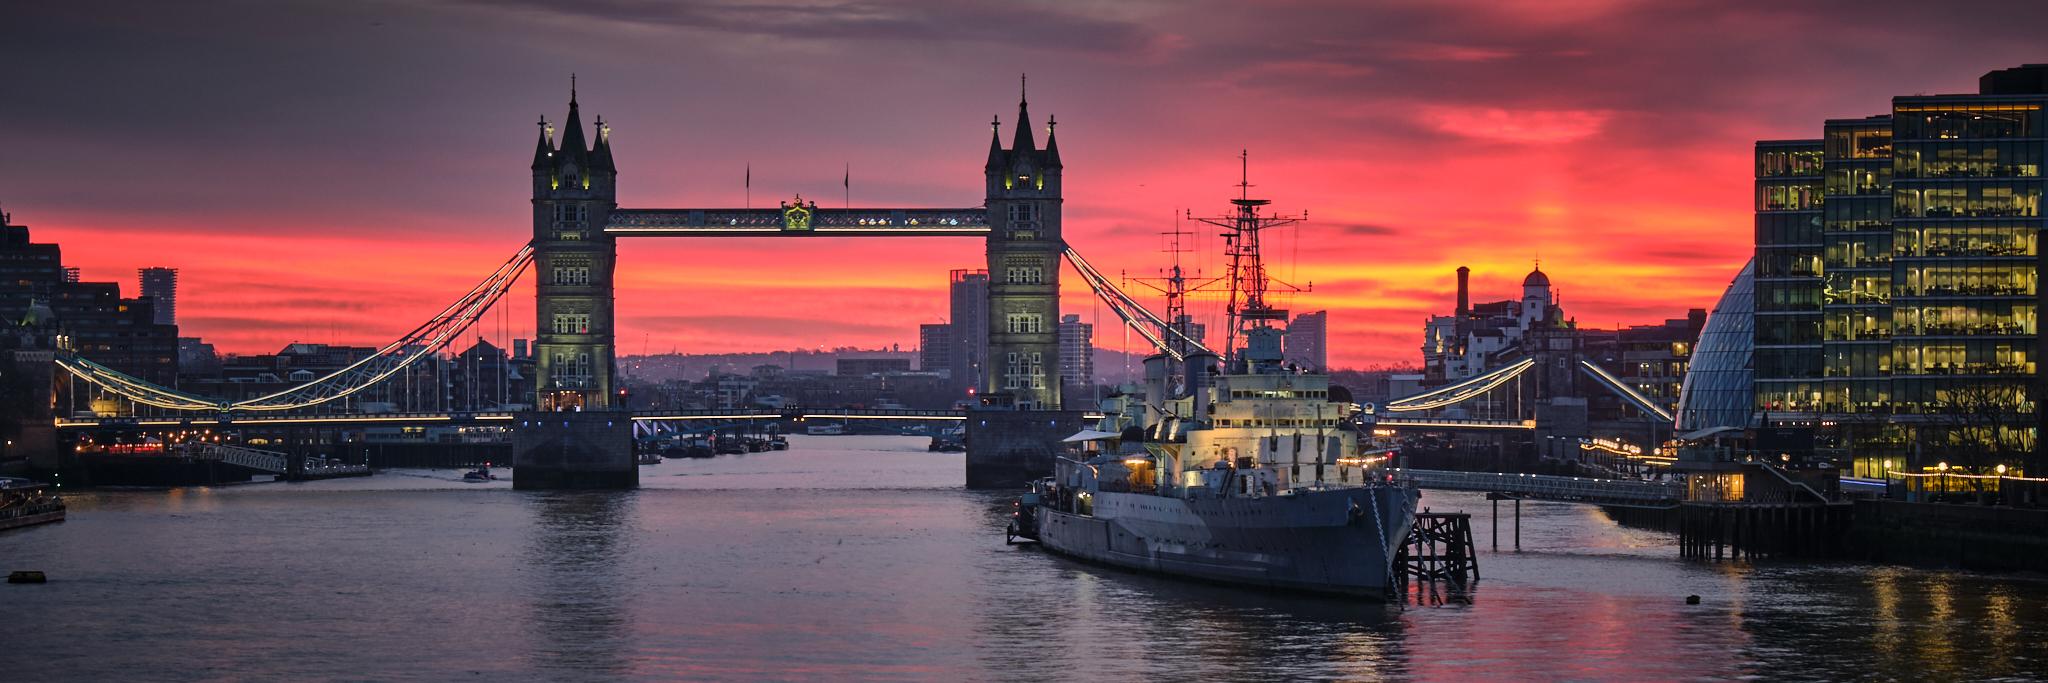 Tower Bridge at dawn Fuji X-T3 and 16-55mm